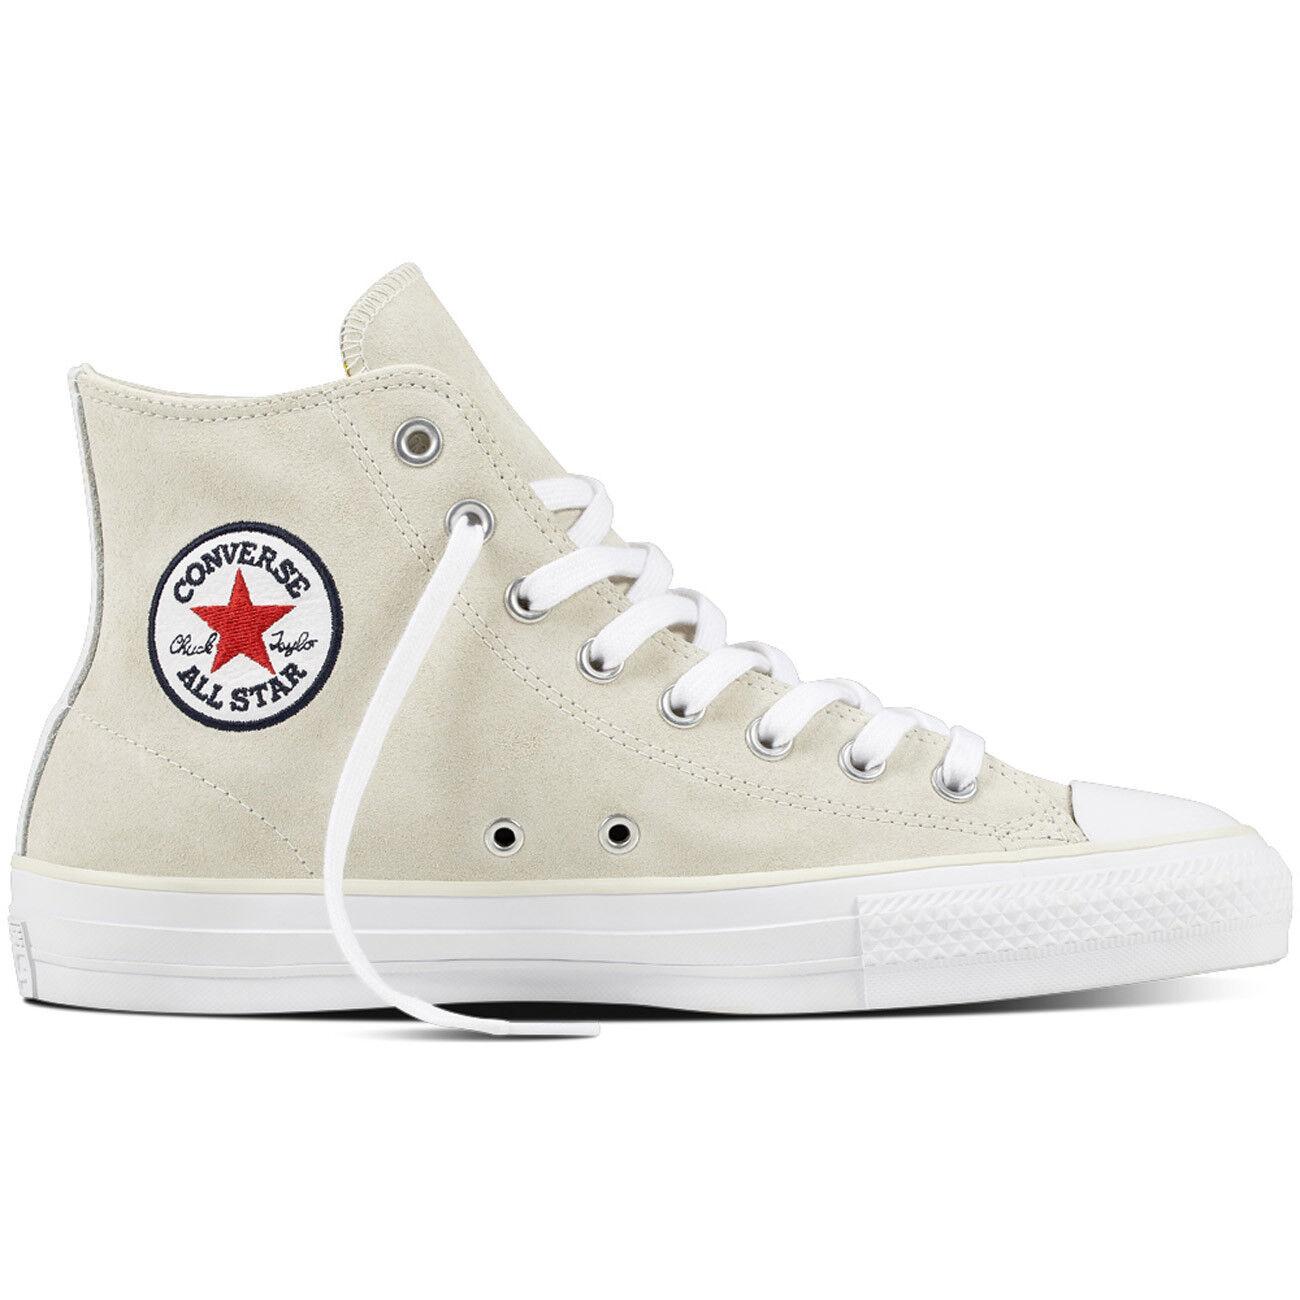 Billig gute Qualität Converse Herren Sneaker CTAS PRO